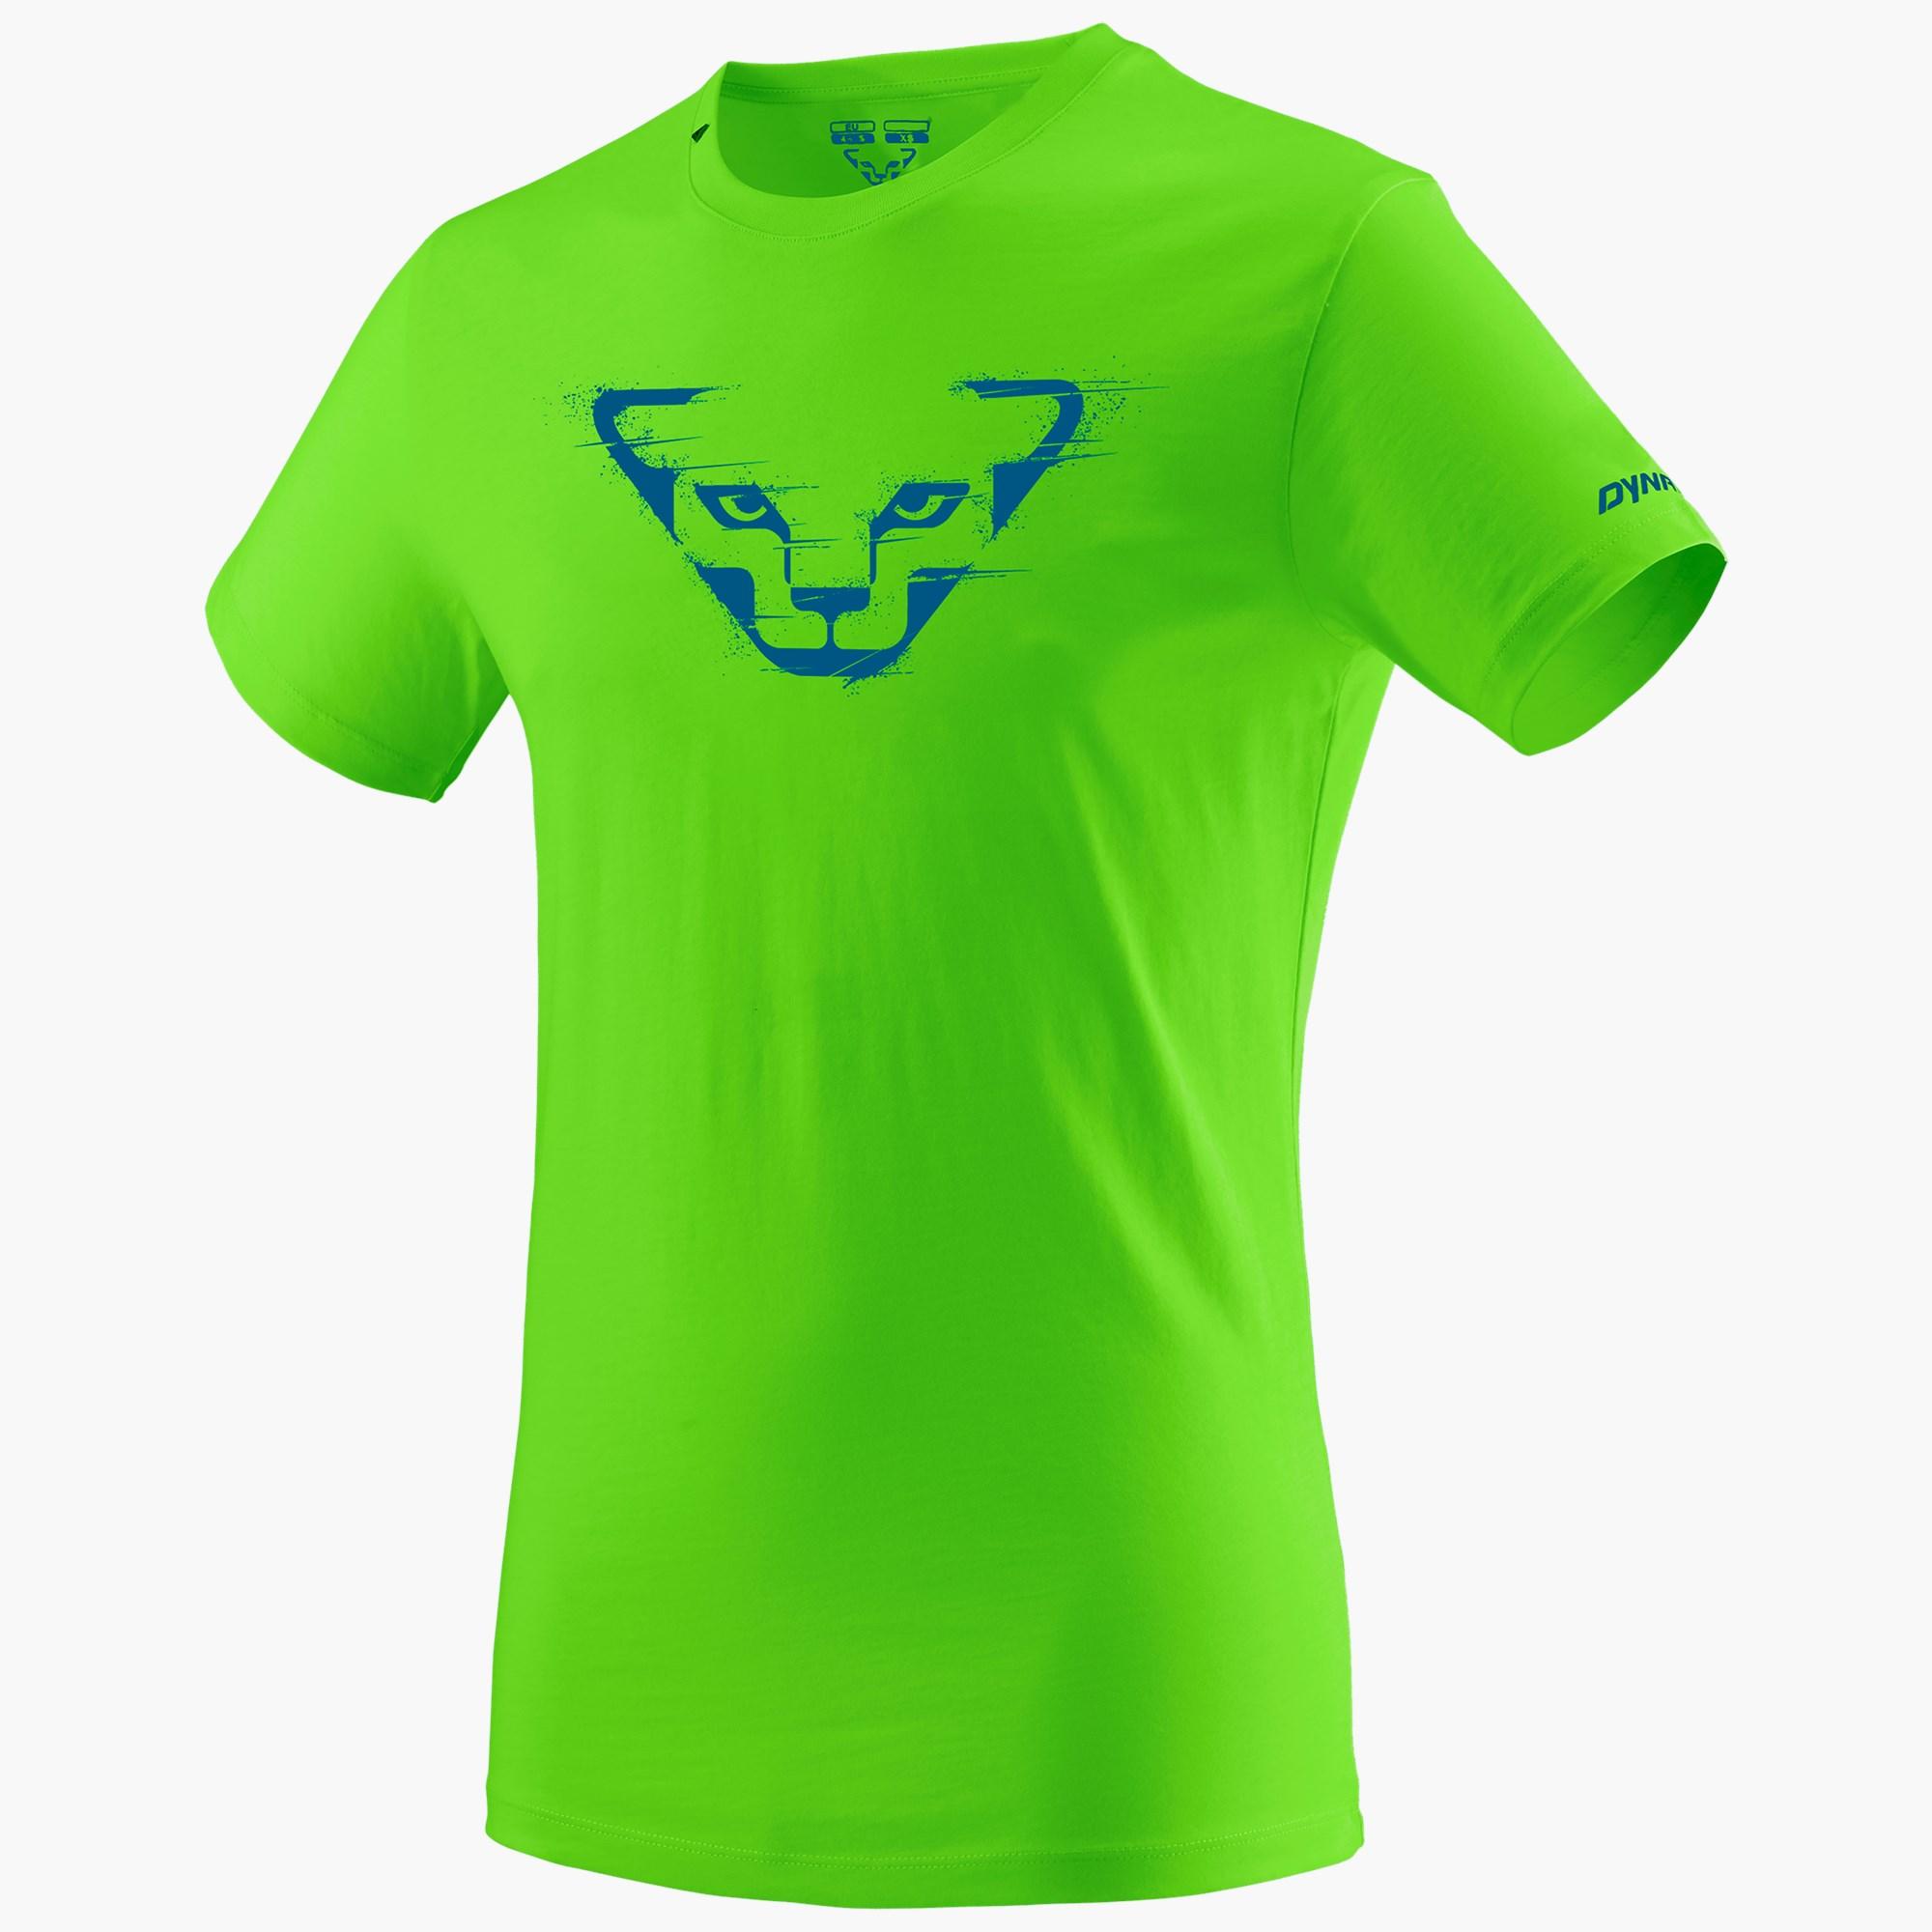 Lambo green/8760/grunge_5642